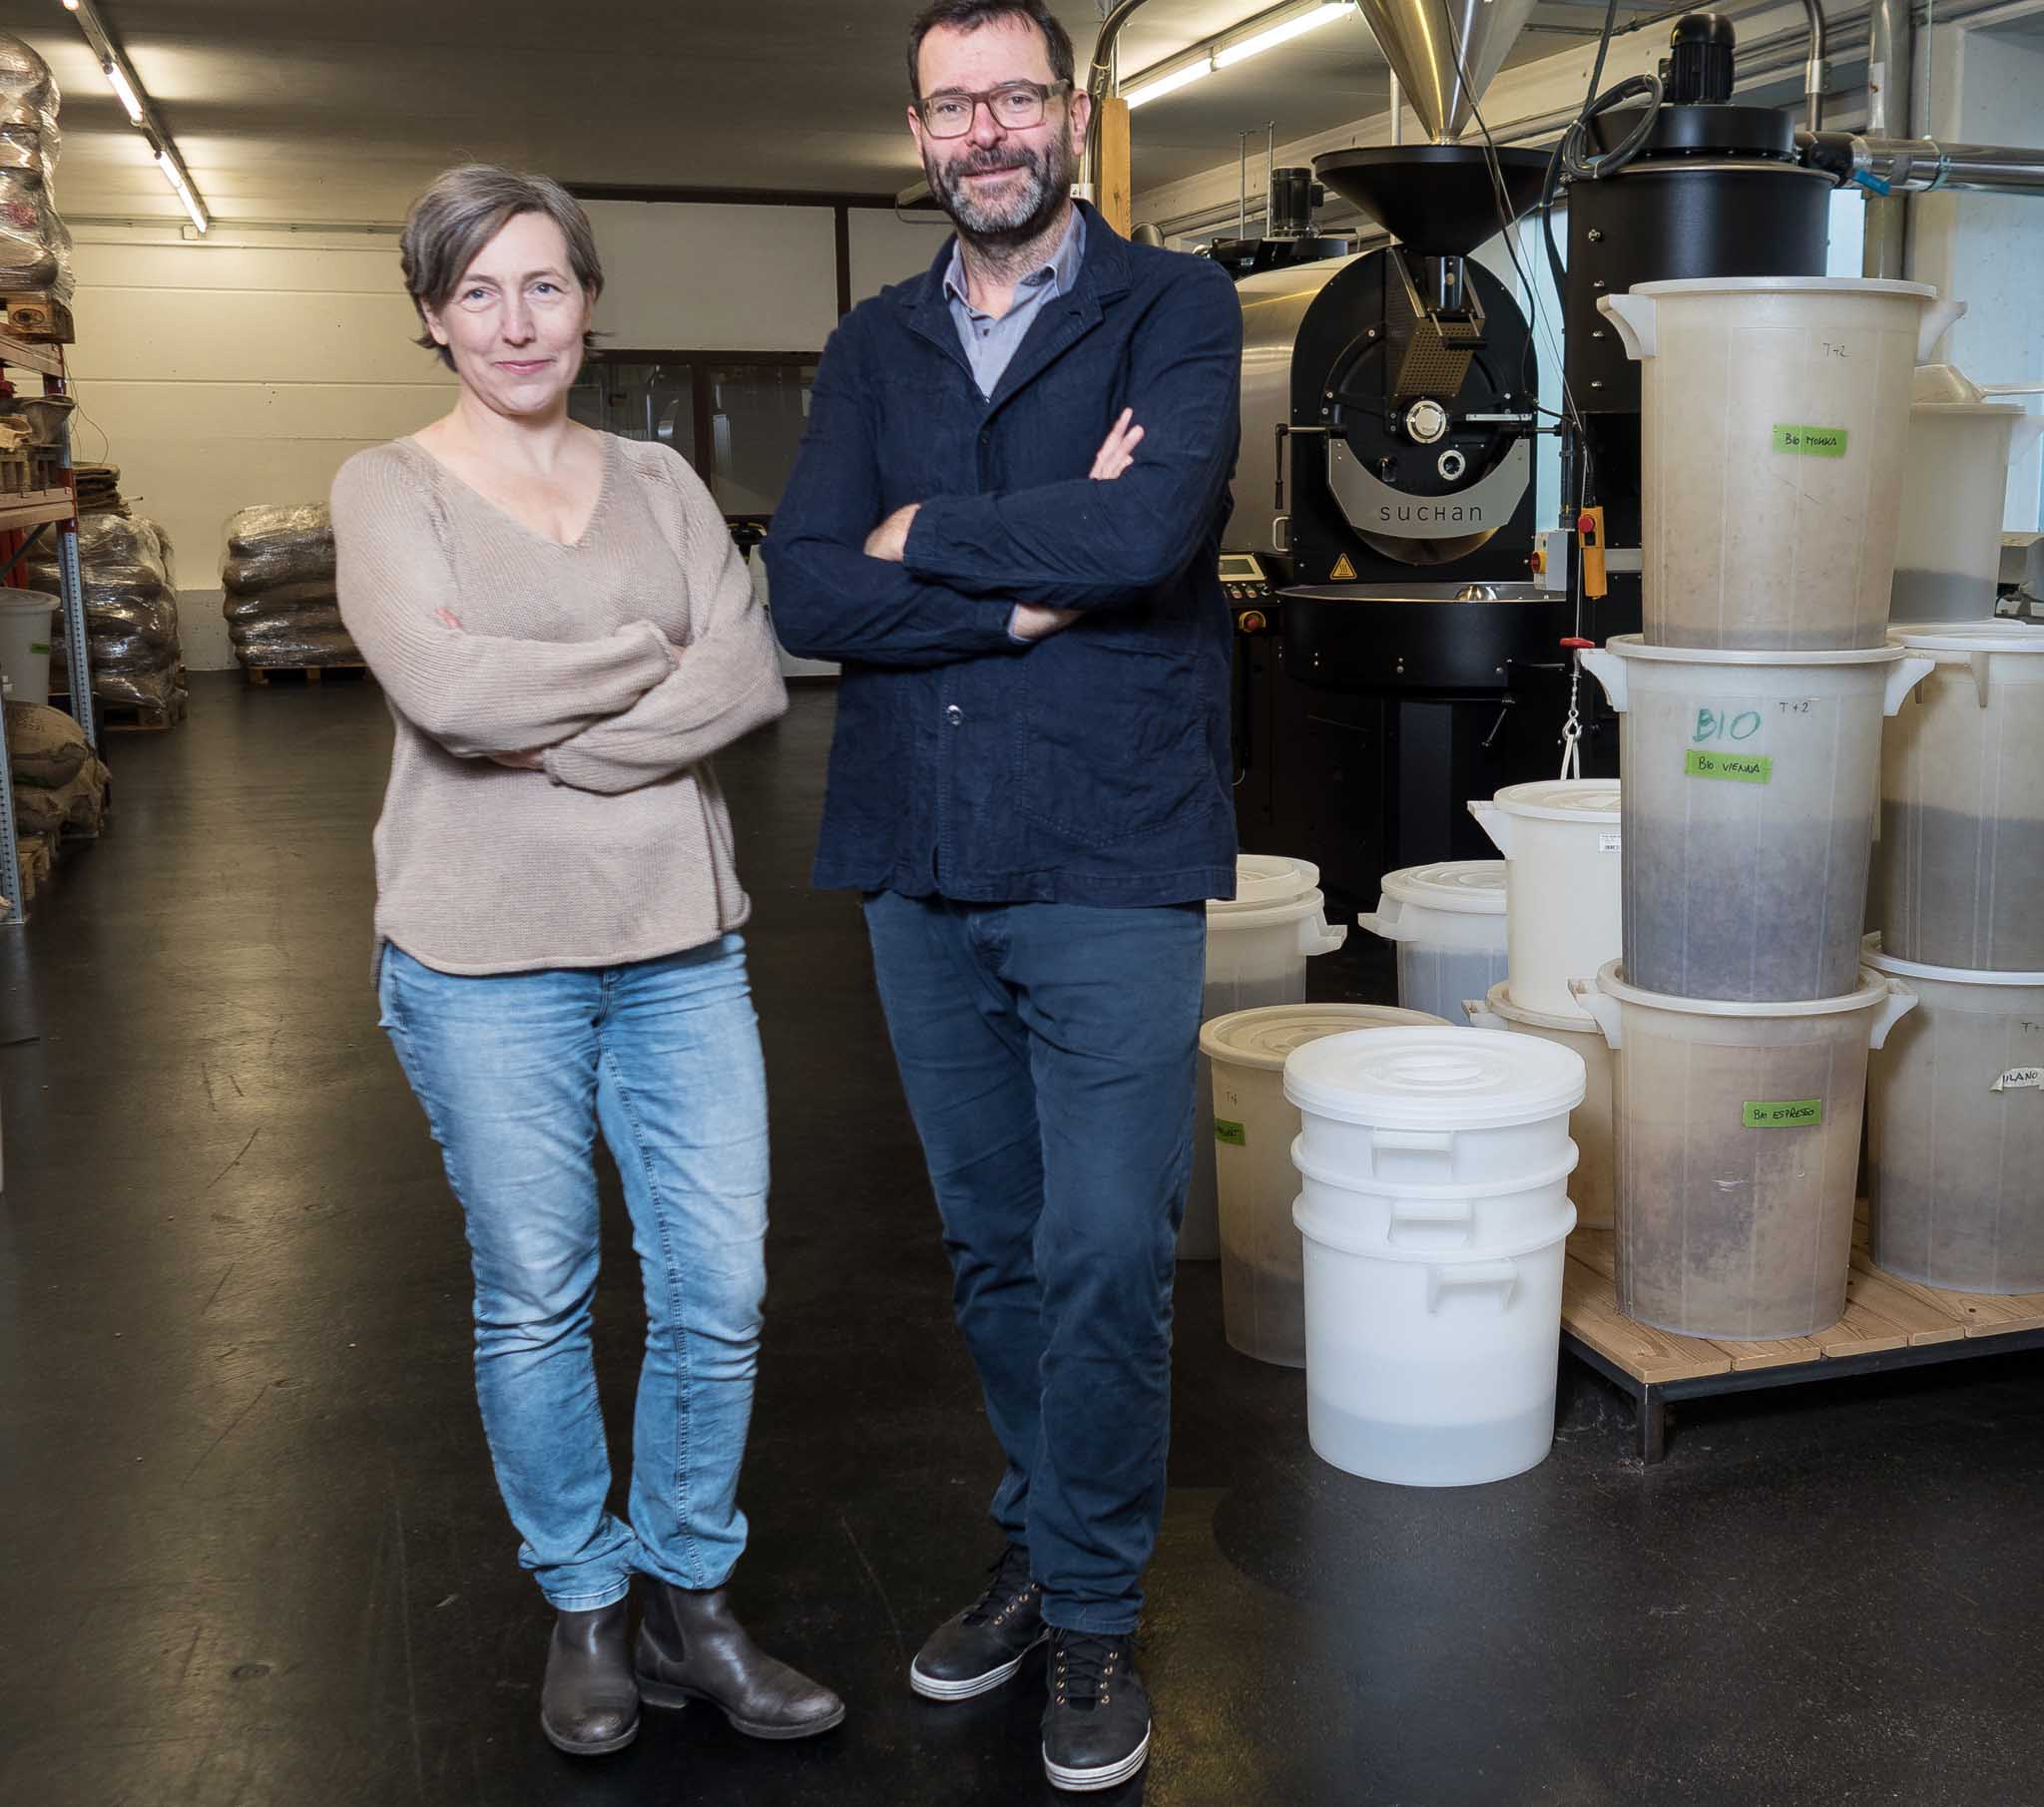 Dagmar und Peter Affenzeller, Kaffeerösterei Suchan, Freistadt